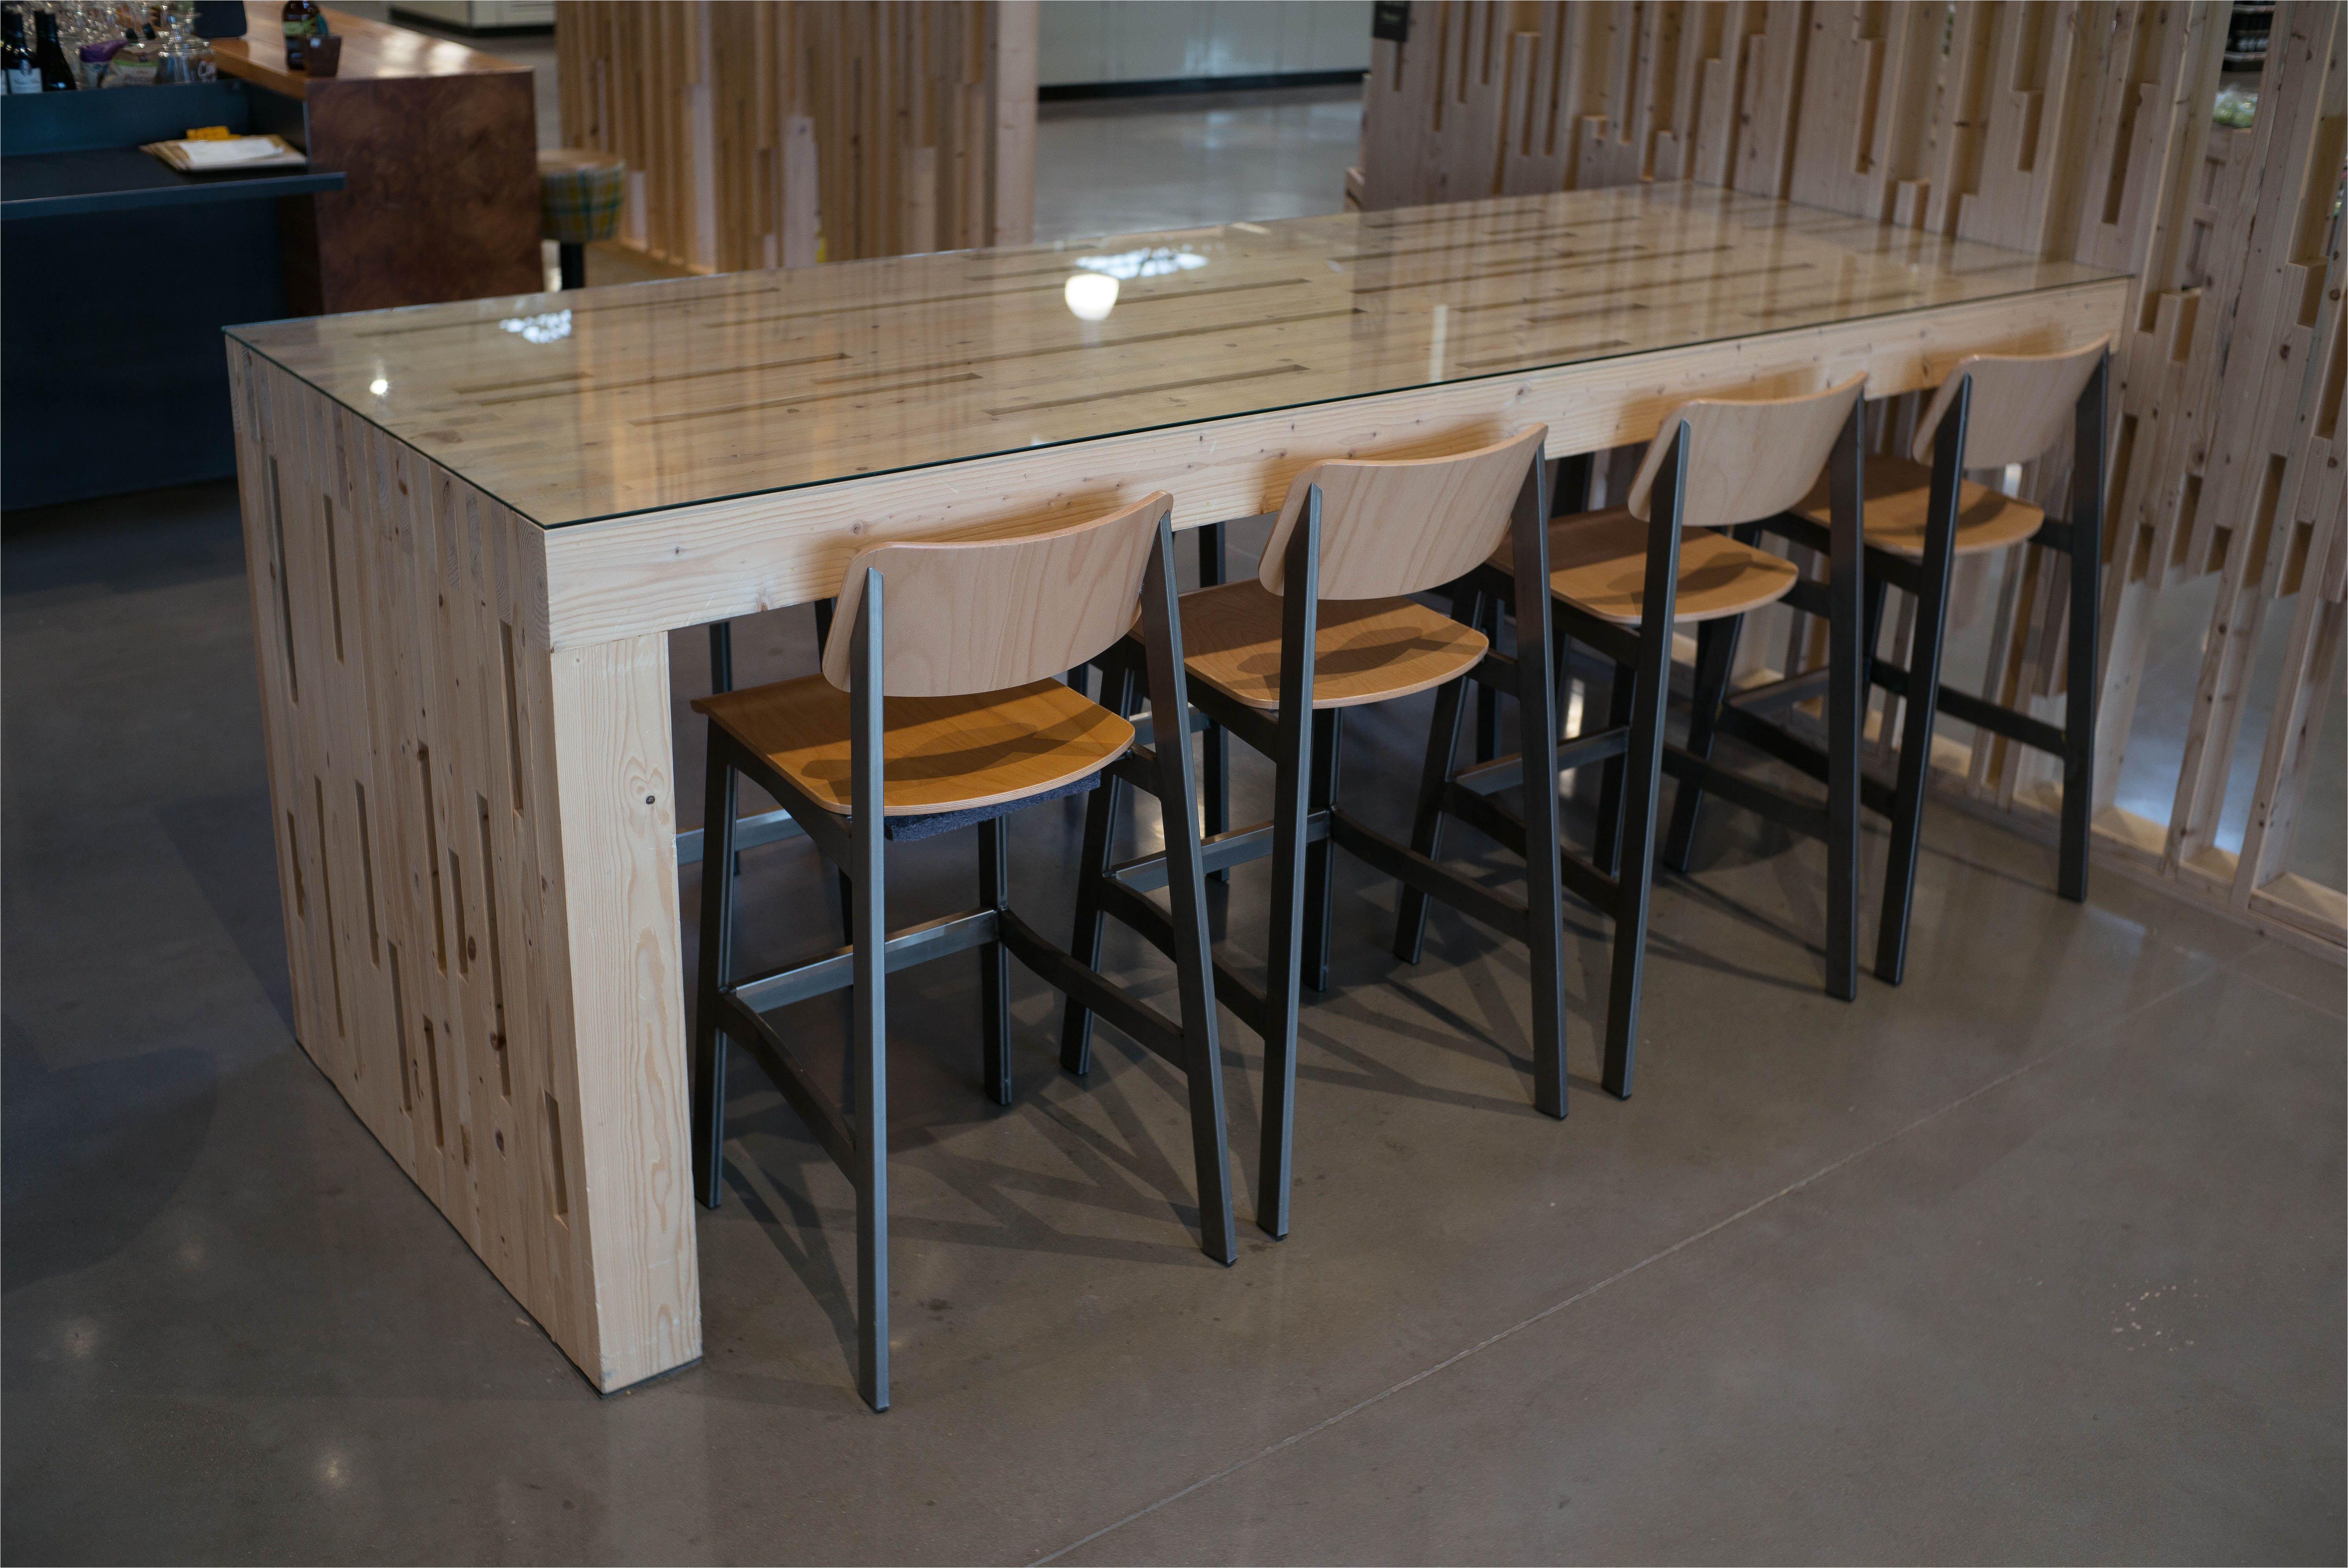 Muebles En Venta Dallas Tx whole Foods Market City Line A New Store Thread Collaborative